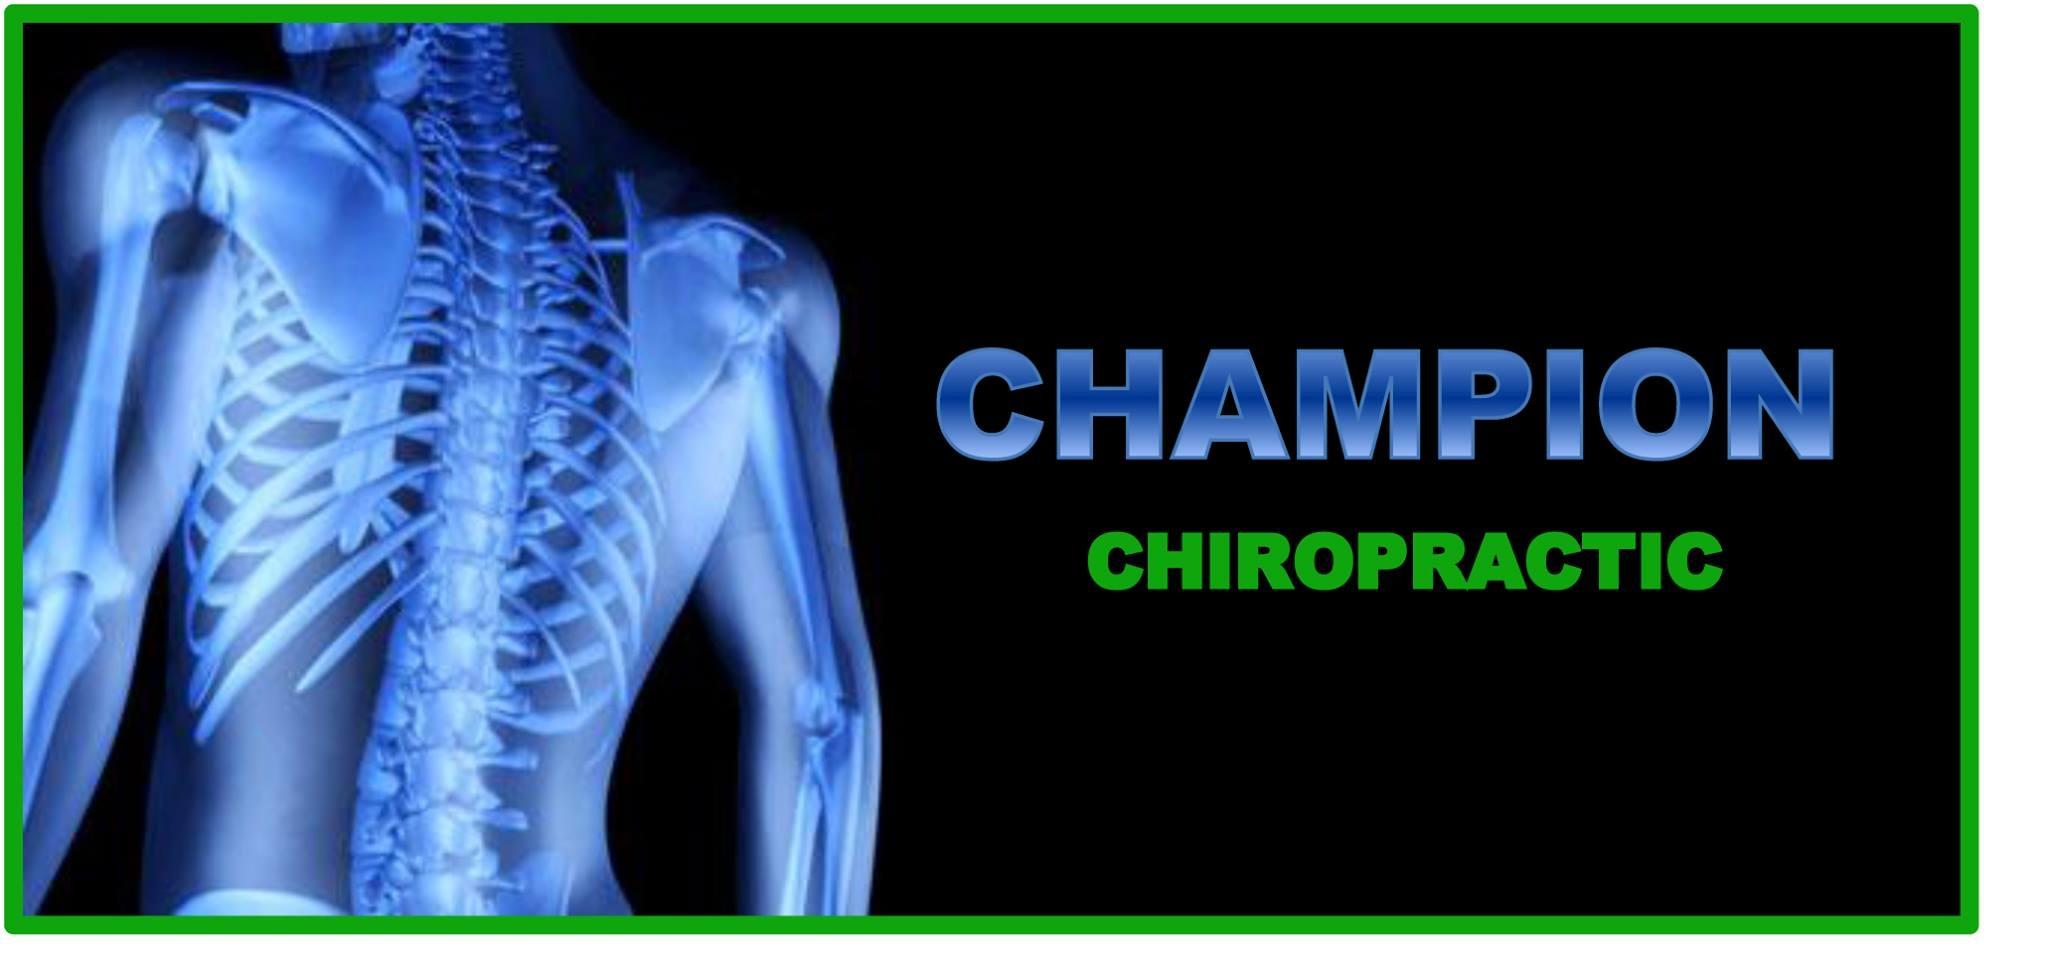 Champion Chiropractic image 1